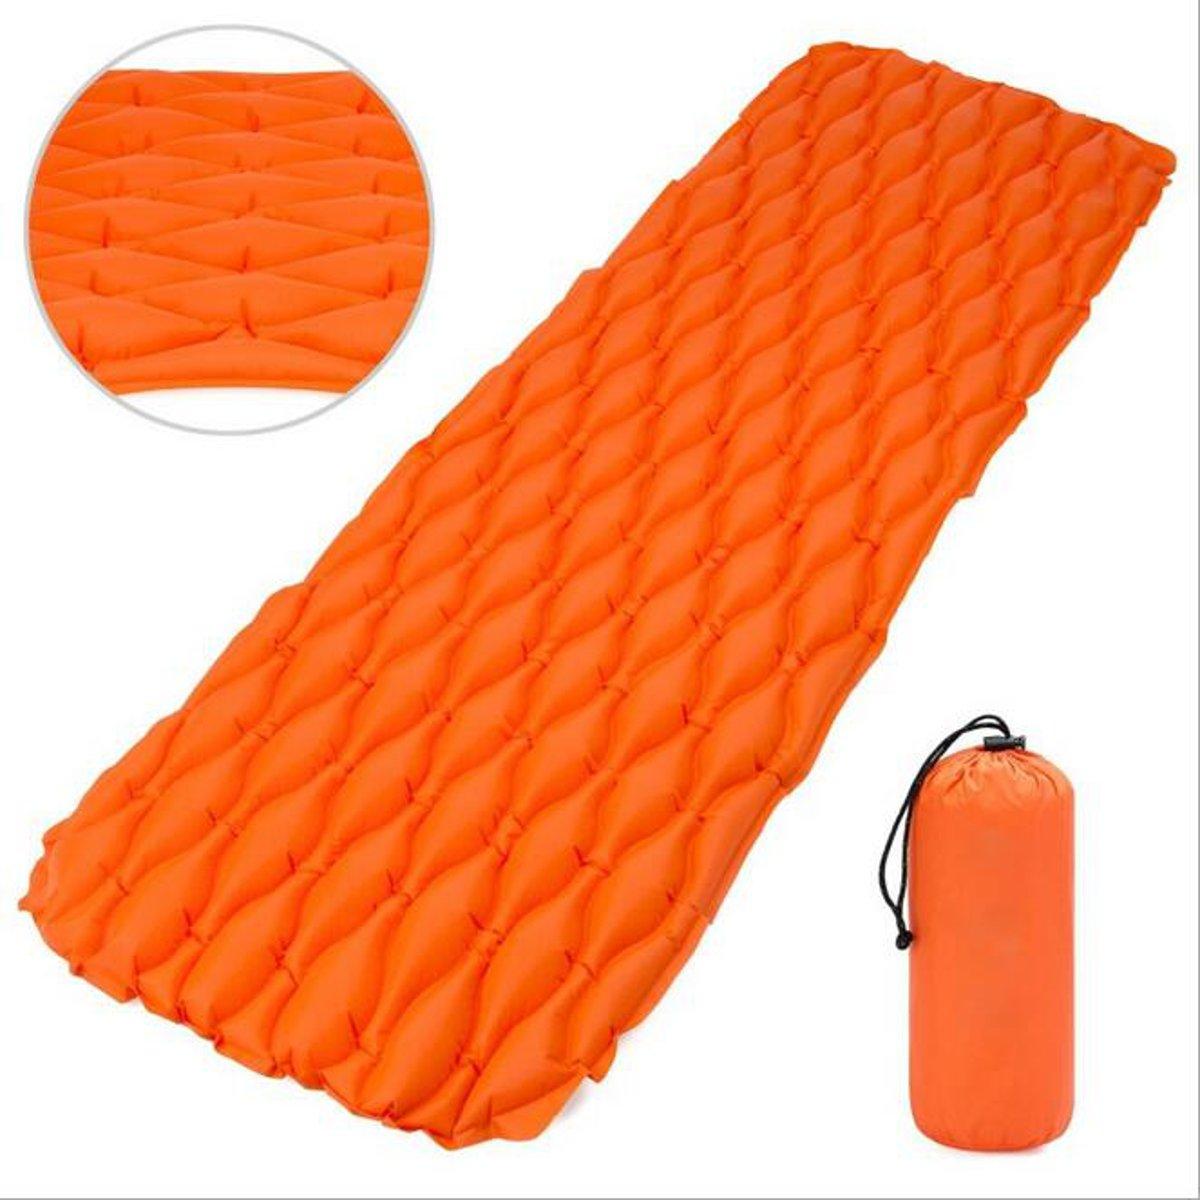 Portable Inflatable Sleeping Pad Compact Camping Backpacking Air Pad Lightweight Sleeping Mat Portable Hiking Mattress